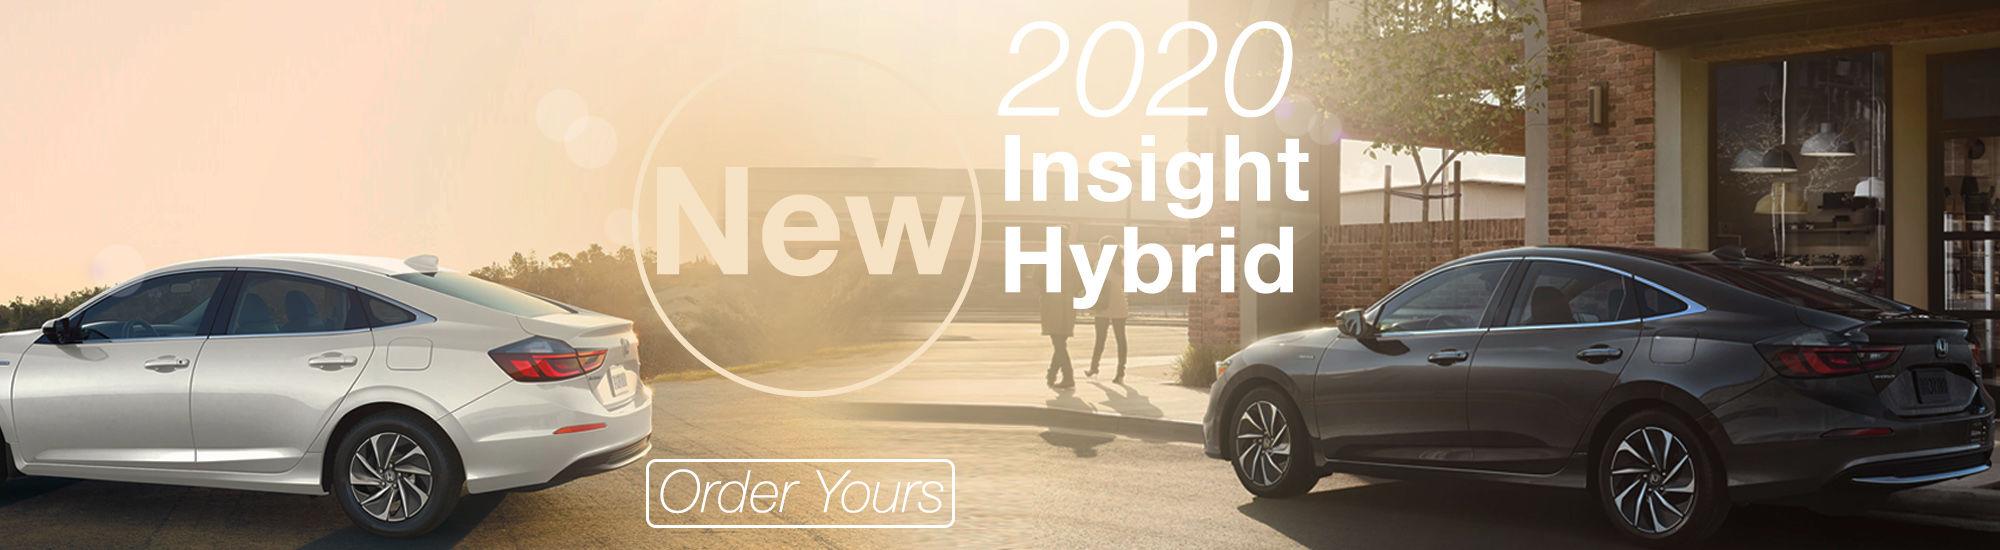 Honda Insight Hybride 2020